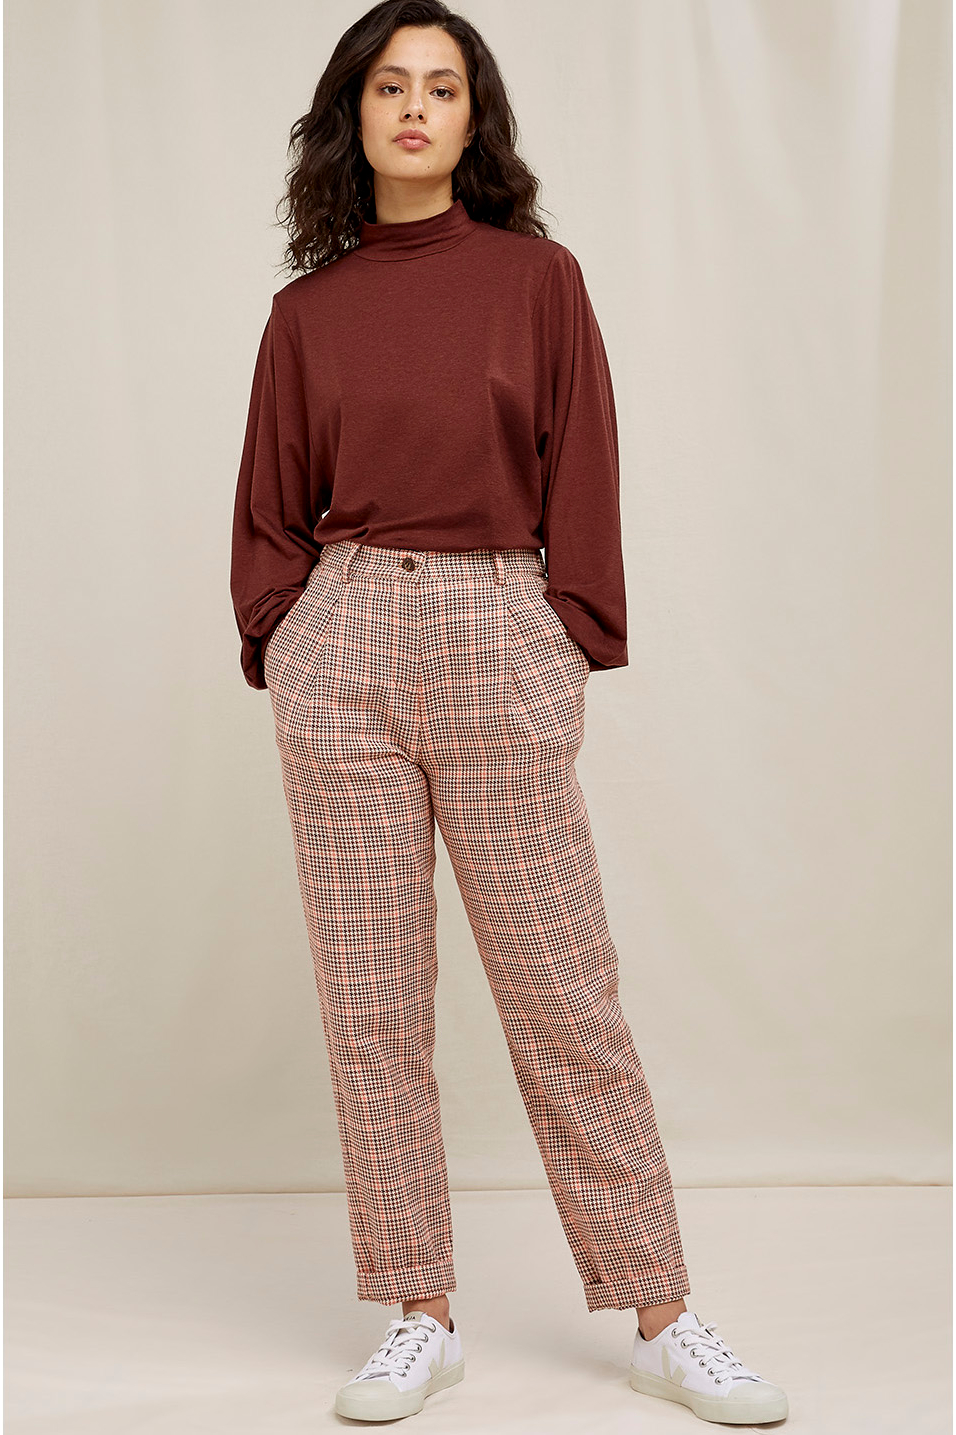 Roberta Organic Fashion Peopletree Hose Annis Houndstooth 3